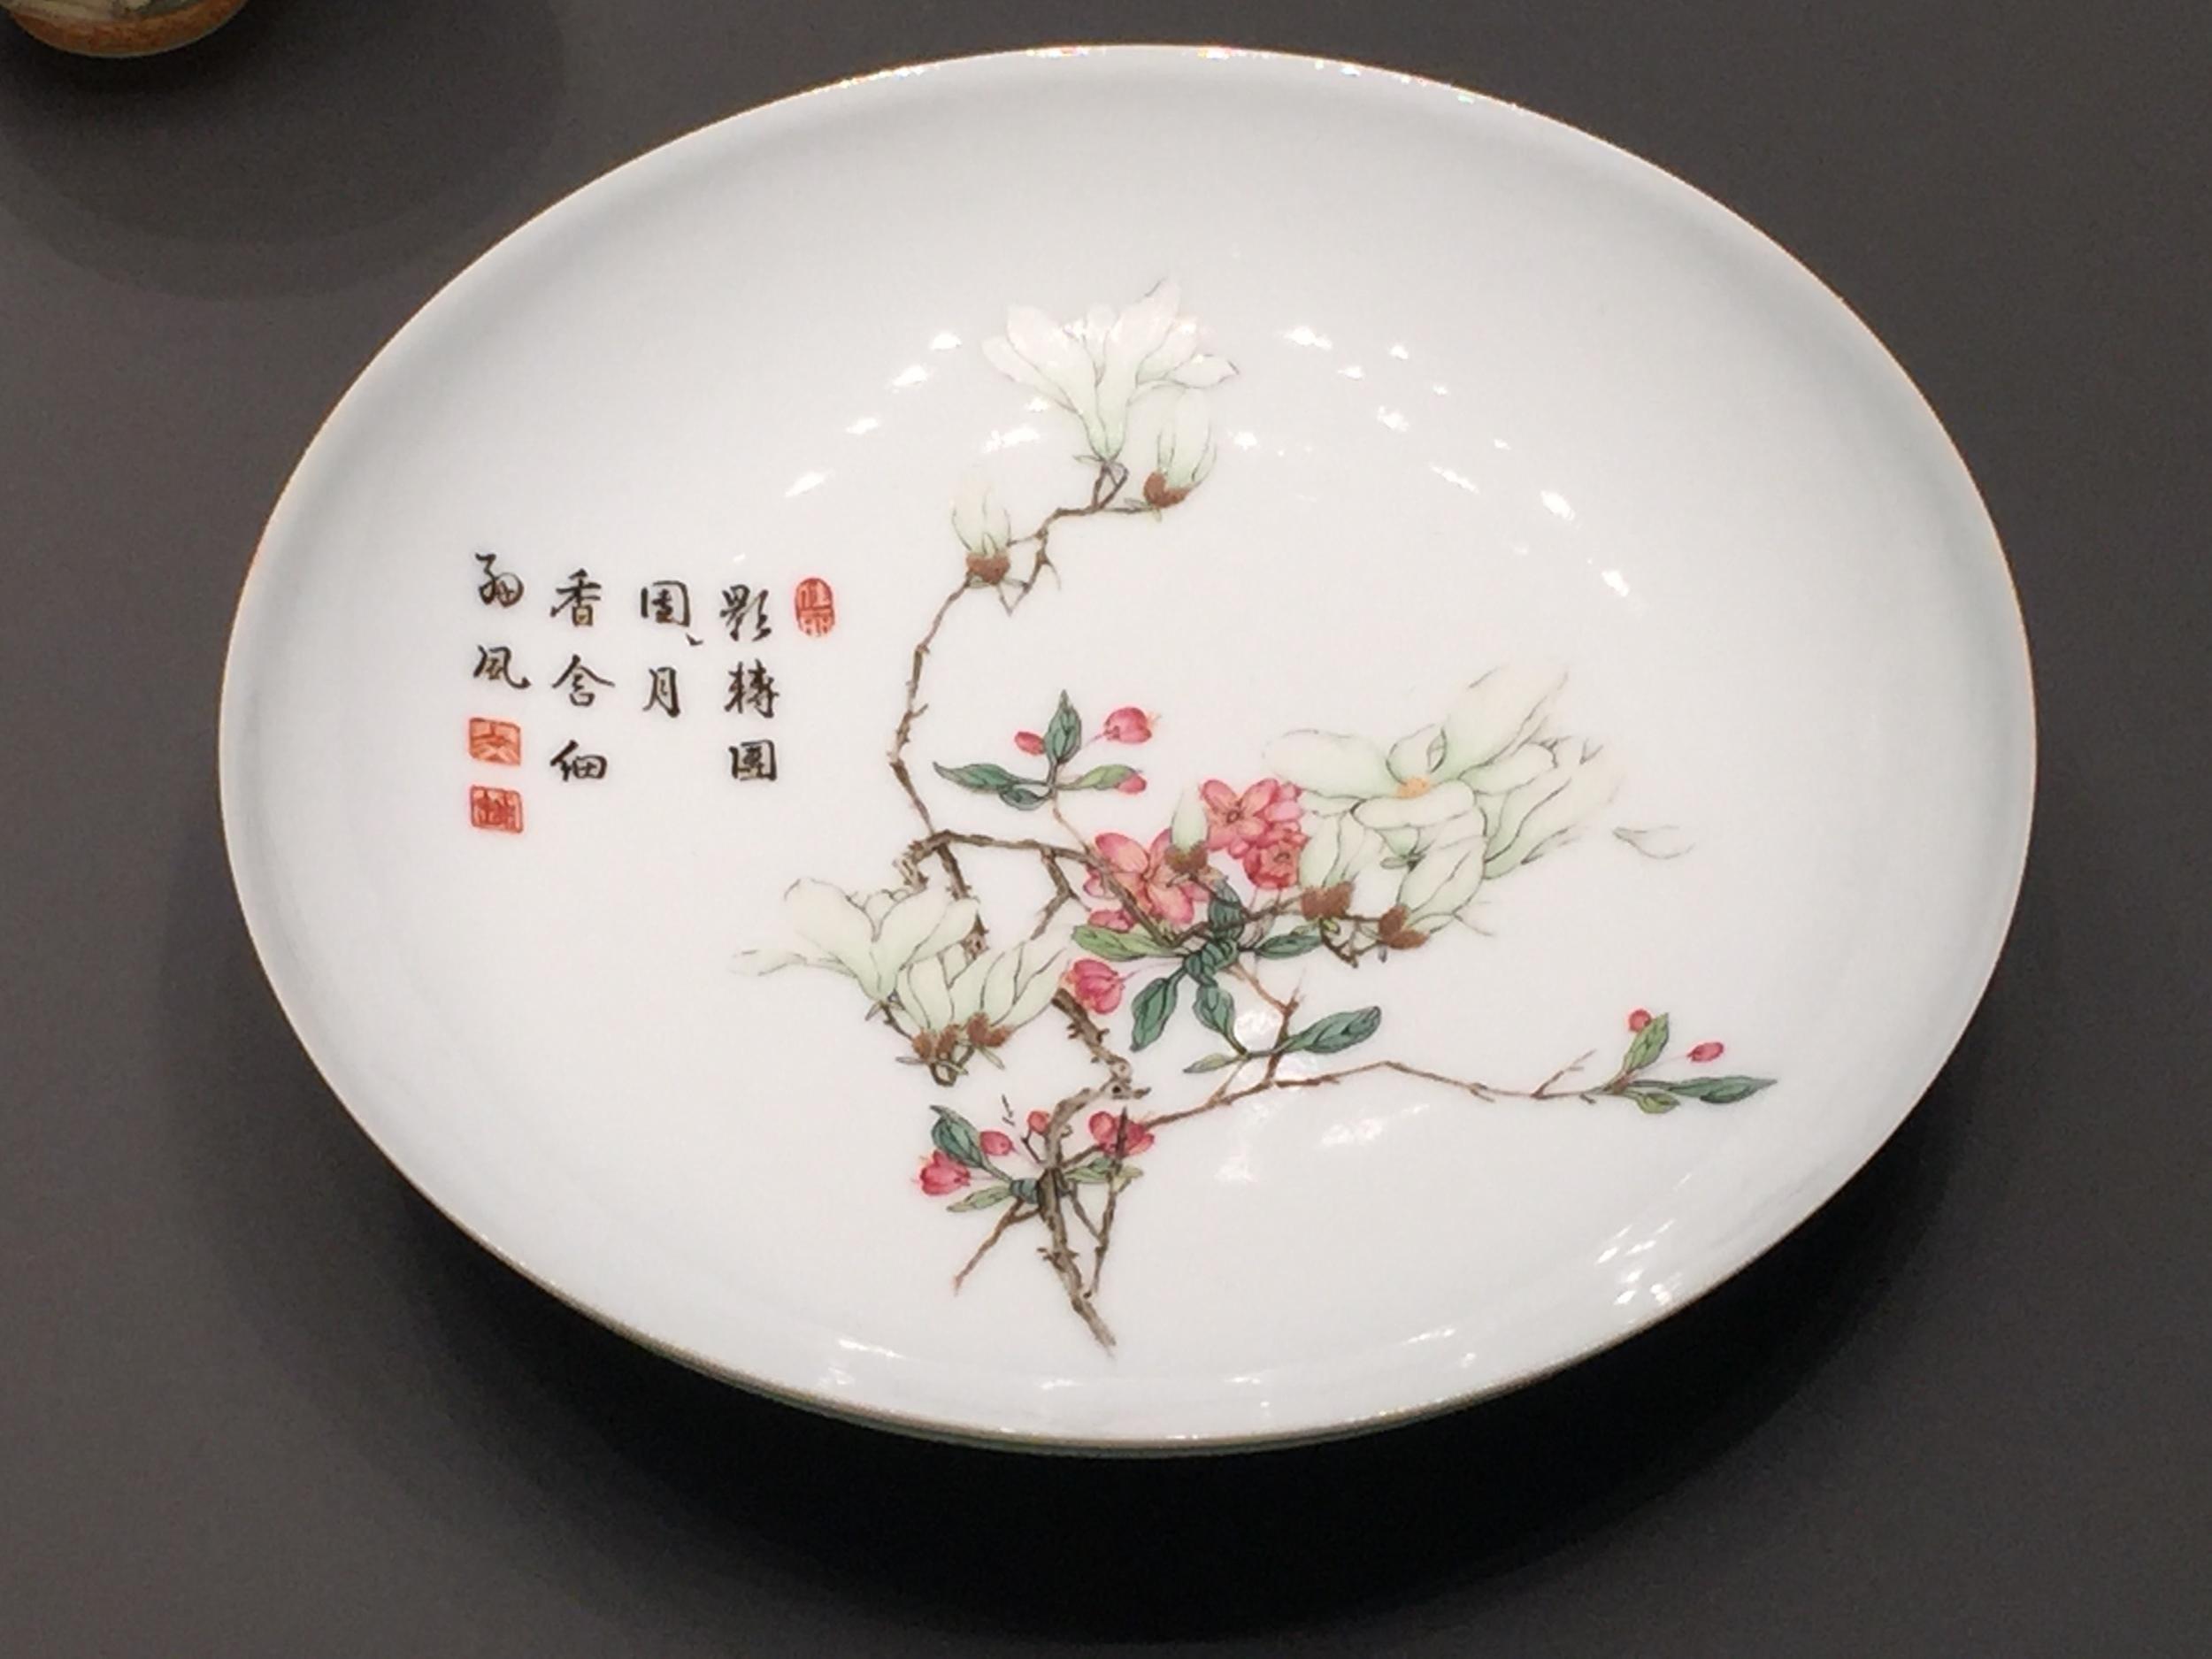 Chinese-Porcelain-British-Museum-Percival-David-jessewaugh.com-144.jpg